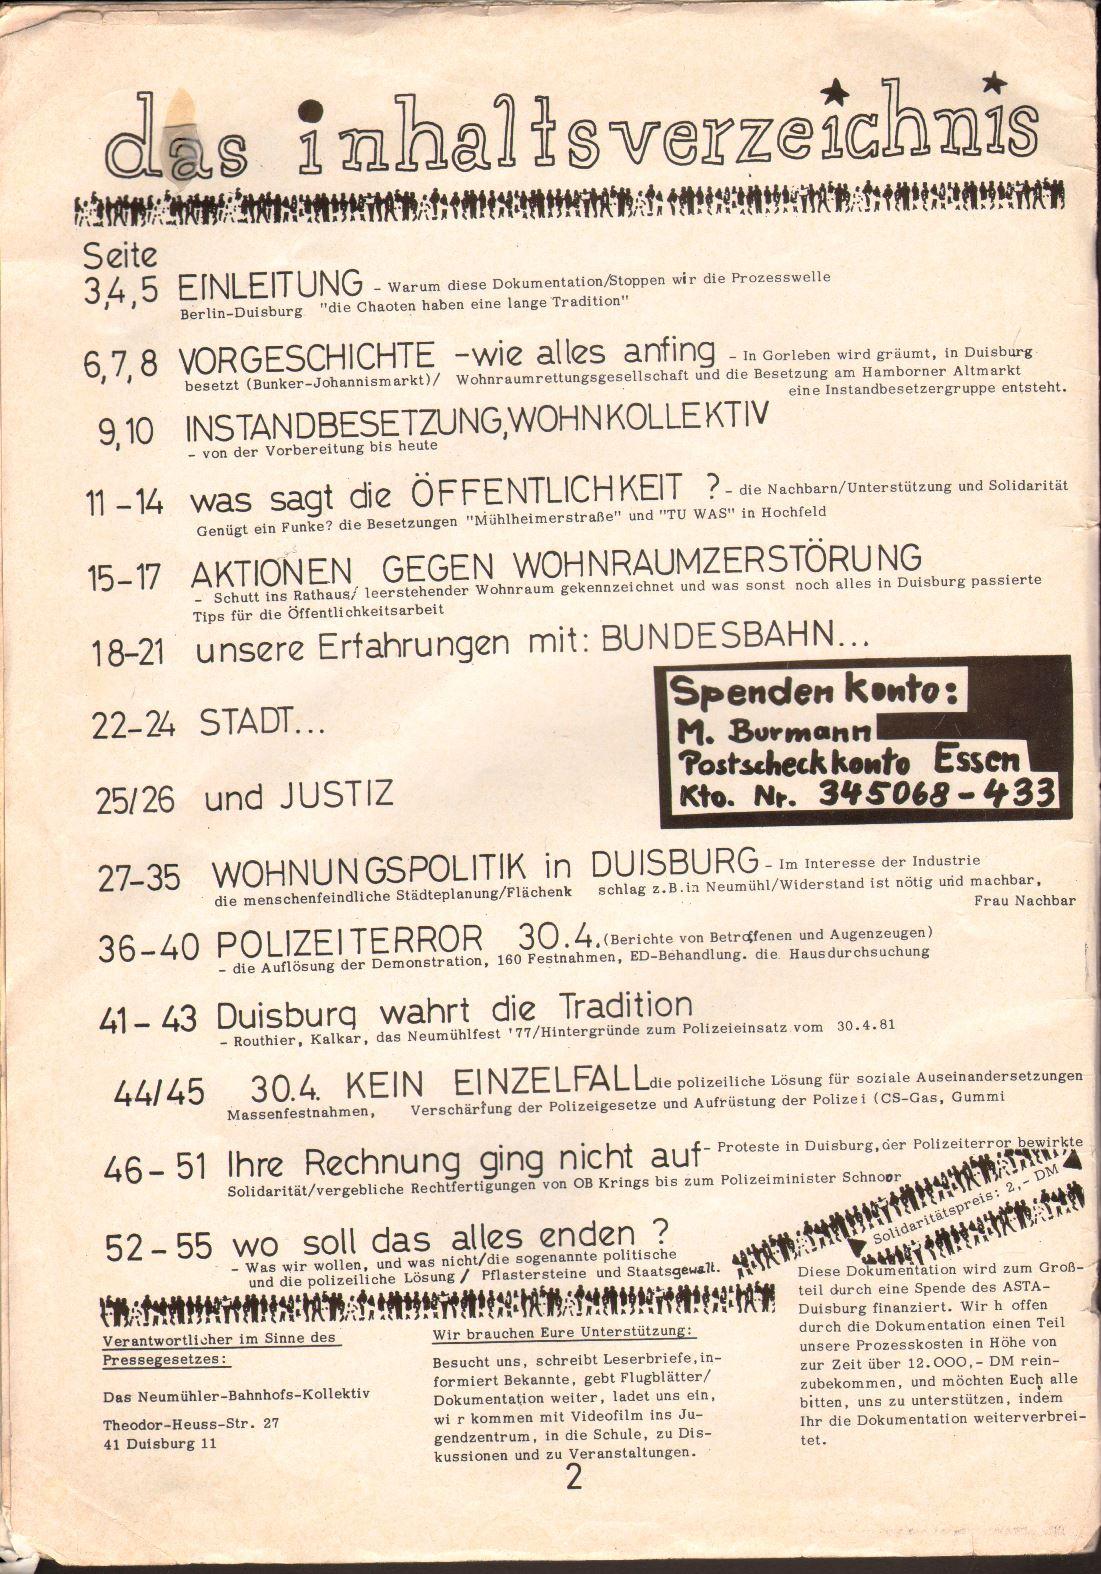 Duisburg_1981_Doku_Neumuehler_Bahnhof_02